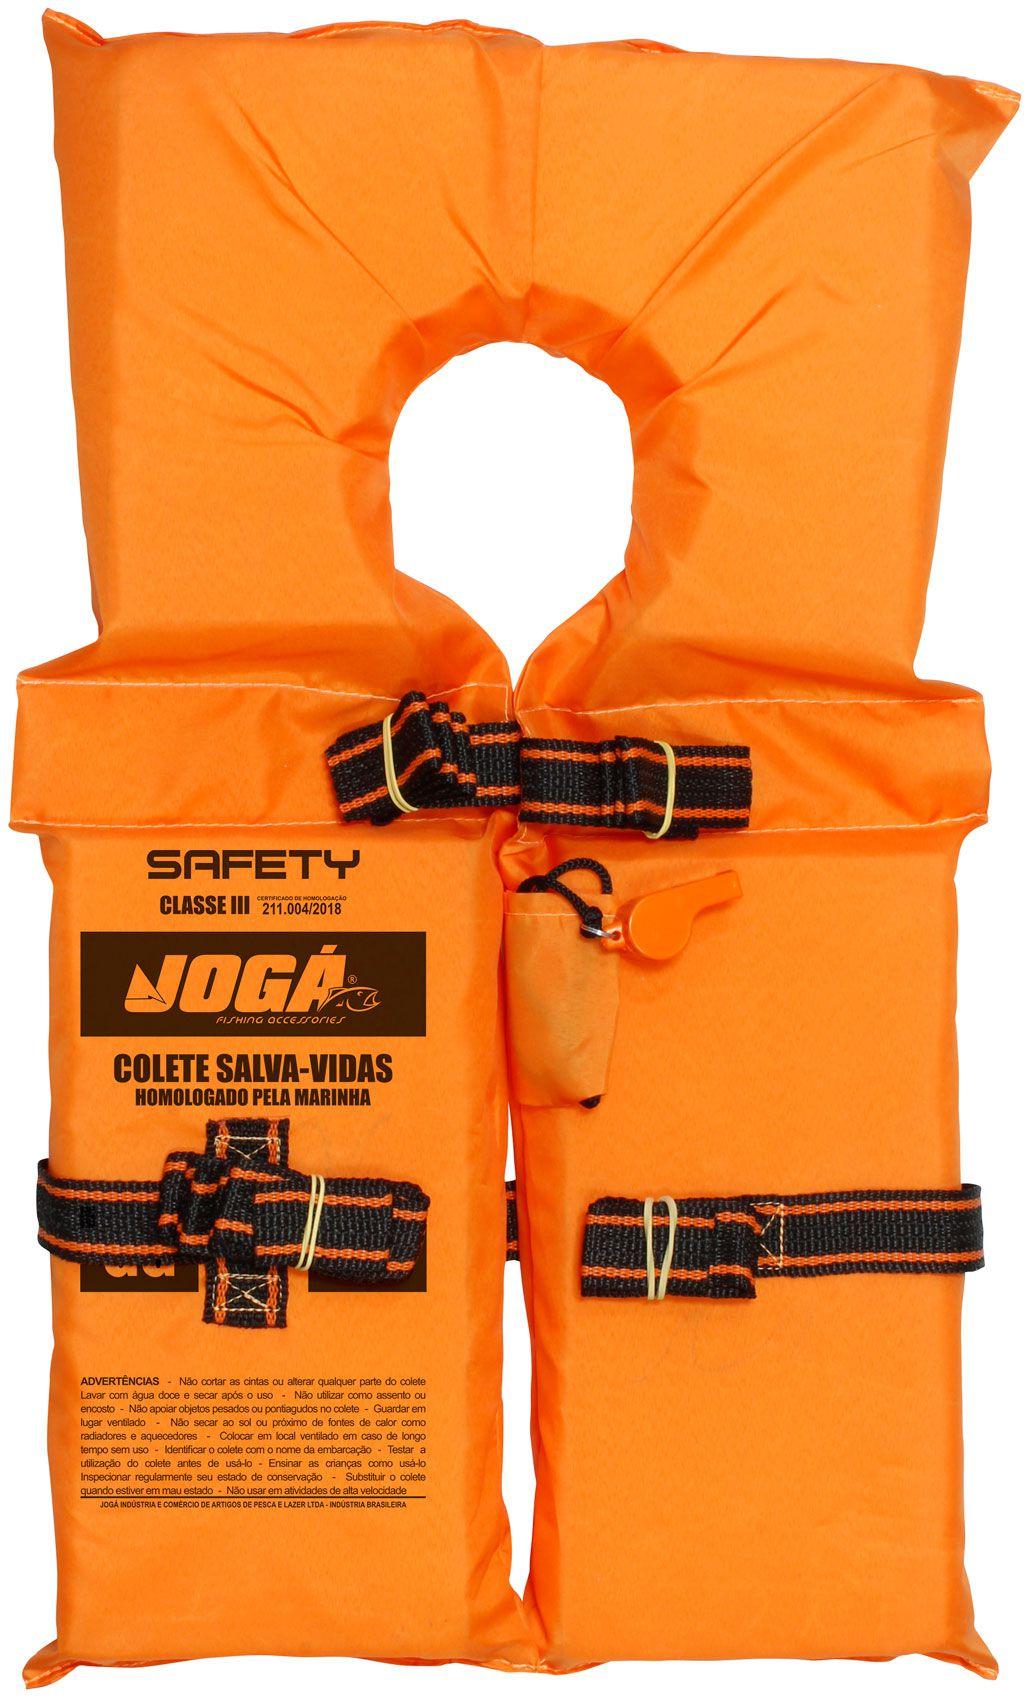 Colete Salva Vidas Jogá Classe 3 Safety Laranja - G